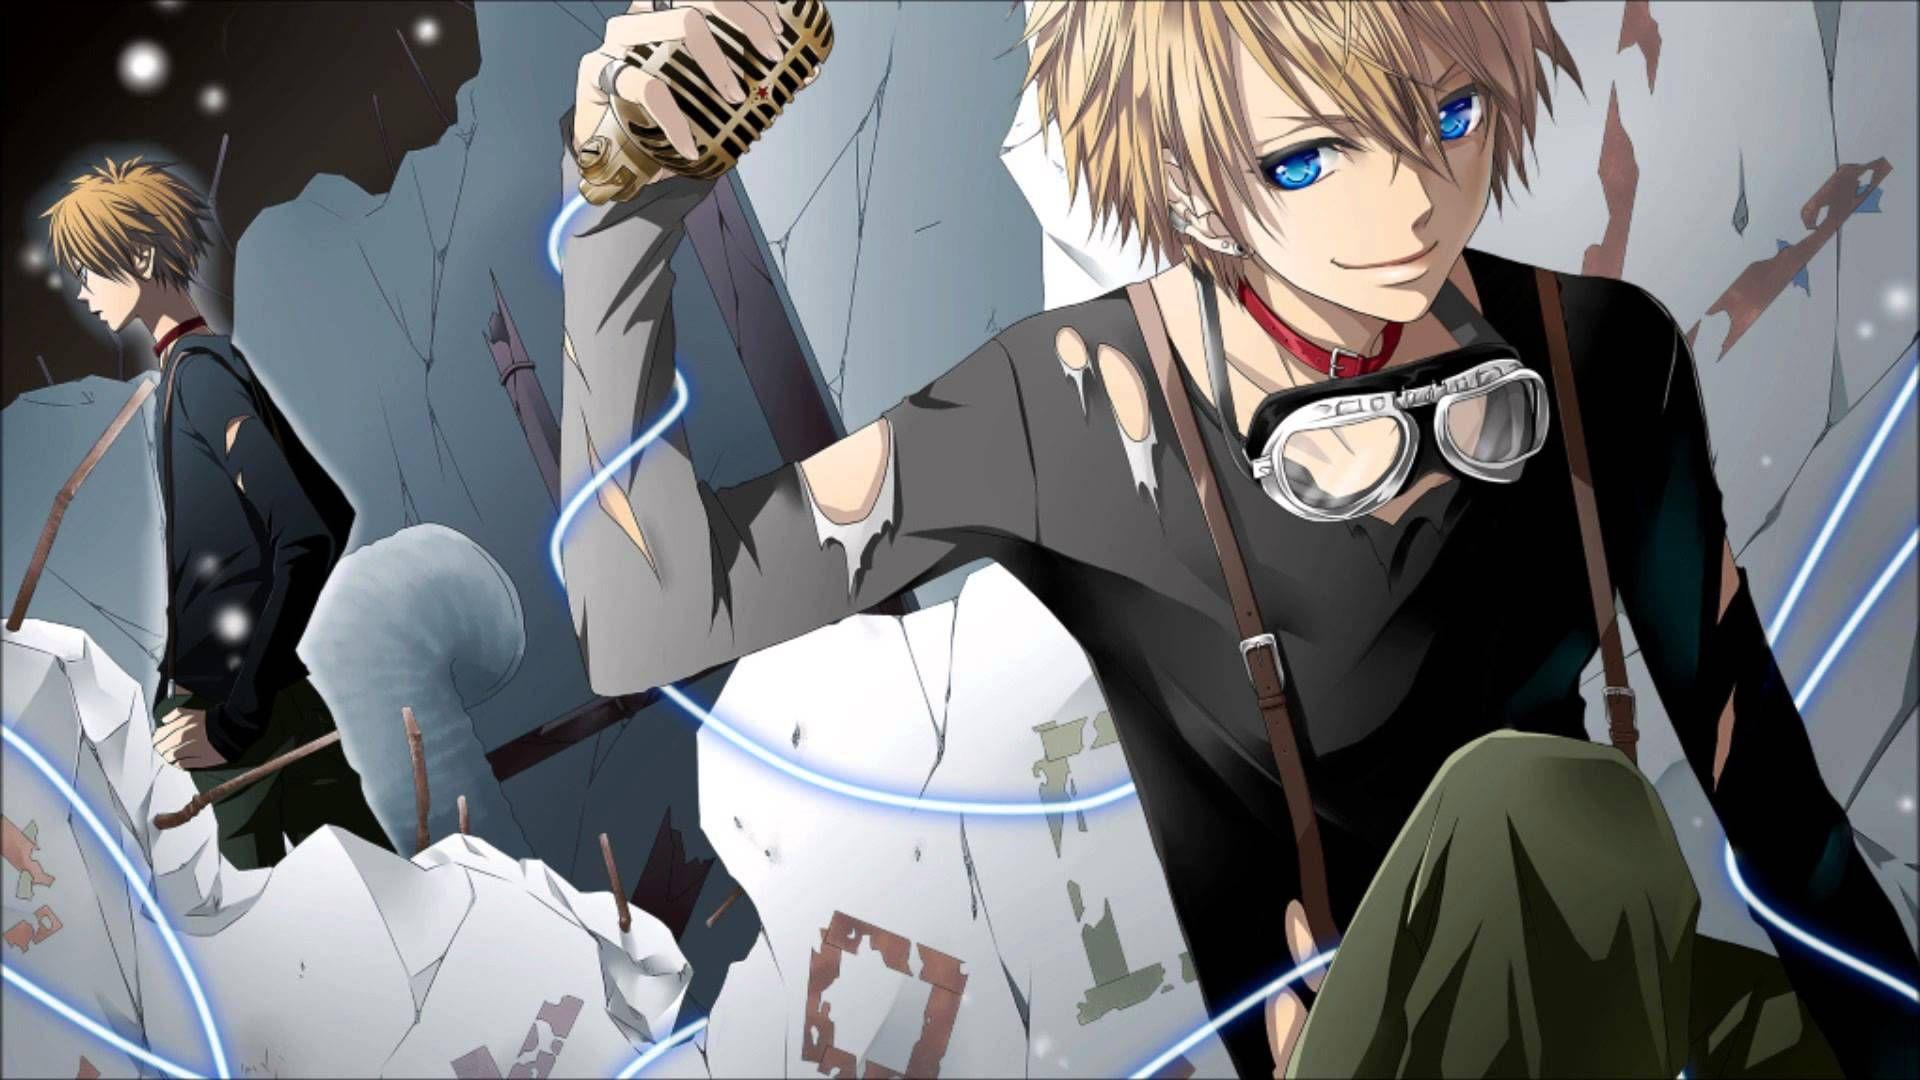 Nightcore Rap God Anime Anime Drawing Books Cool Anime Guys Anime stylish boy wallpaper